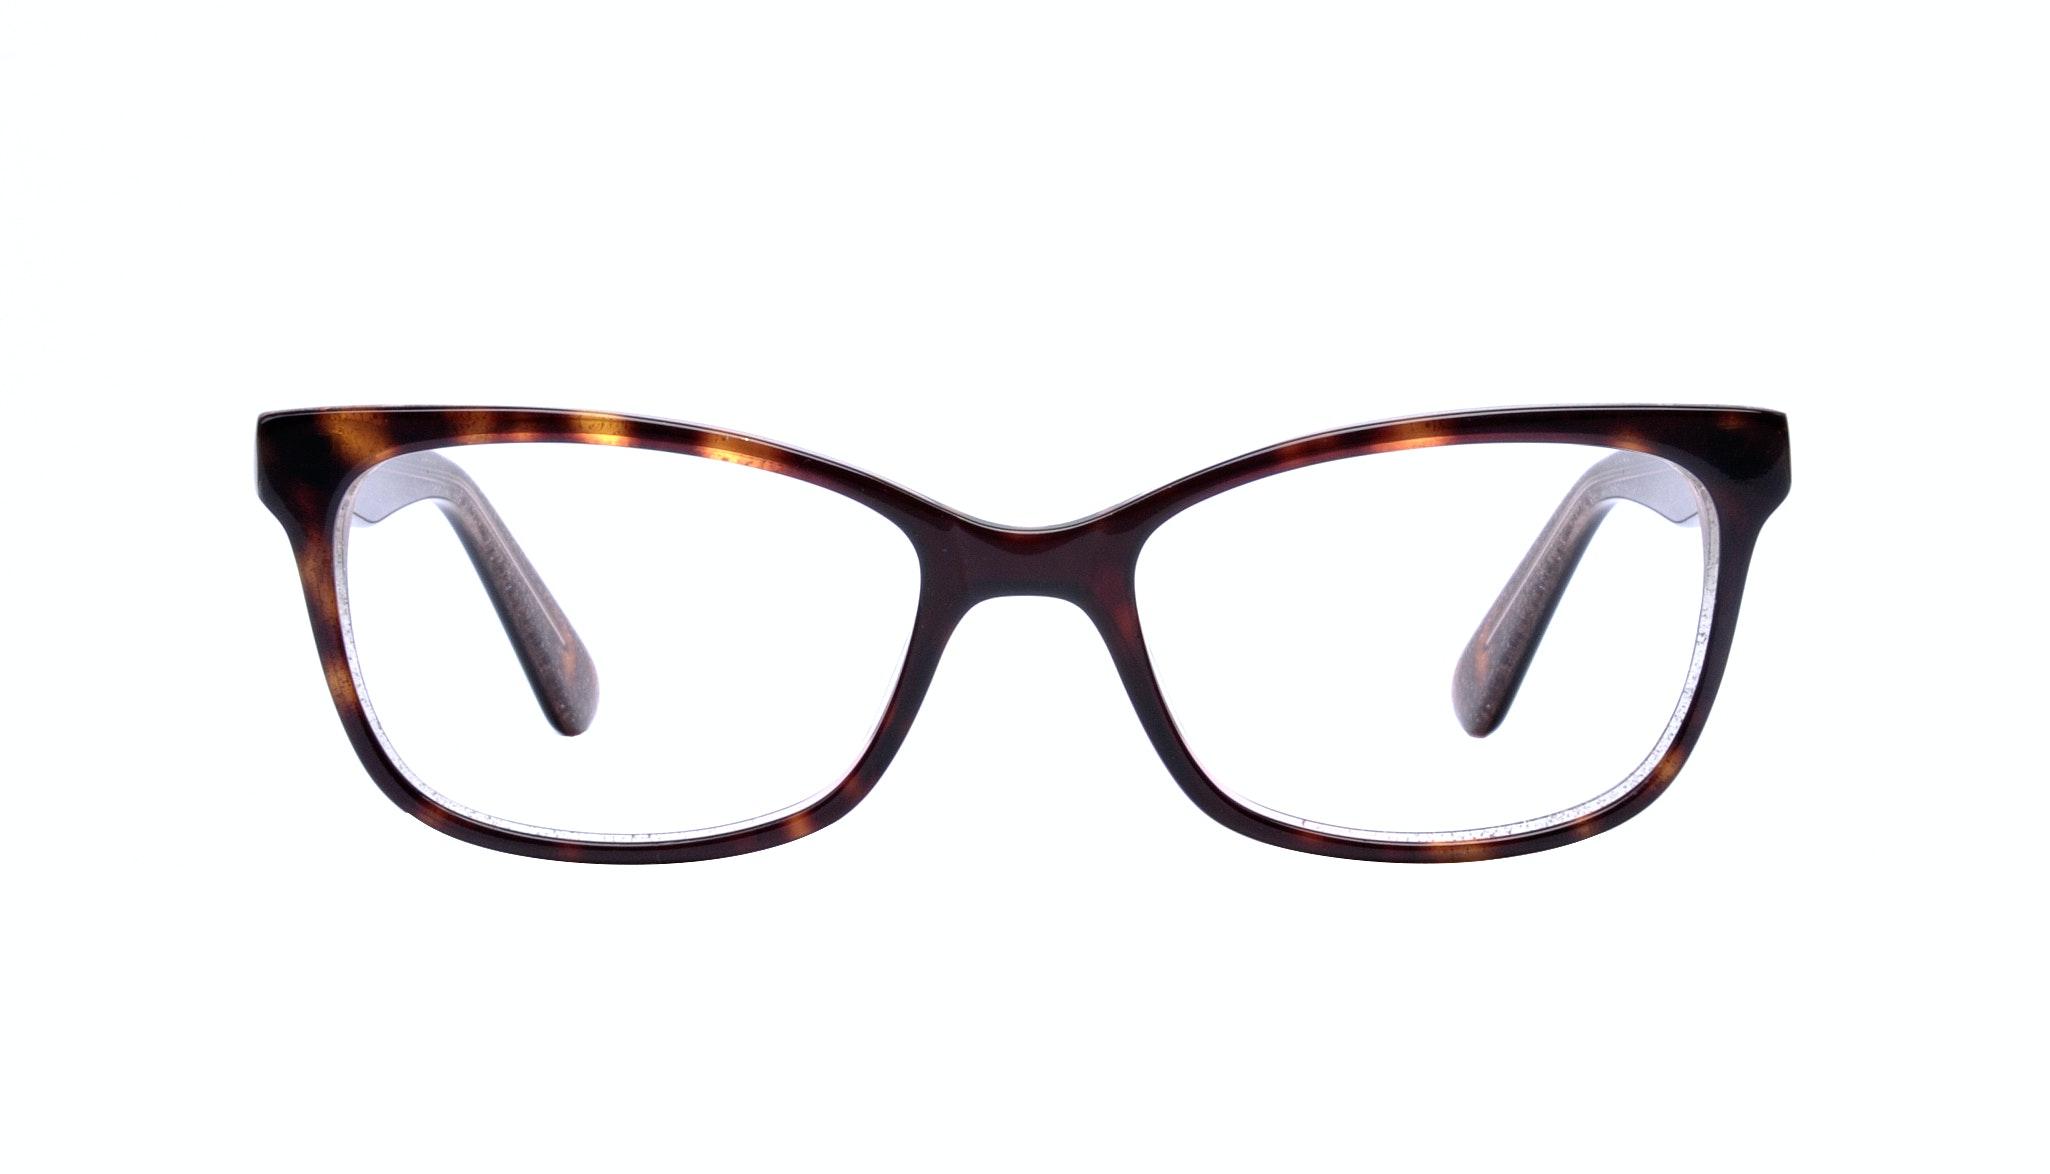 Affordable Fashion Glasses Cat Eye Rectangle Square Eyeglasses Women Comet Hazel Stardust Front